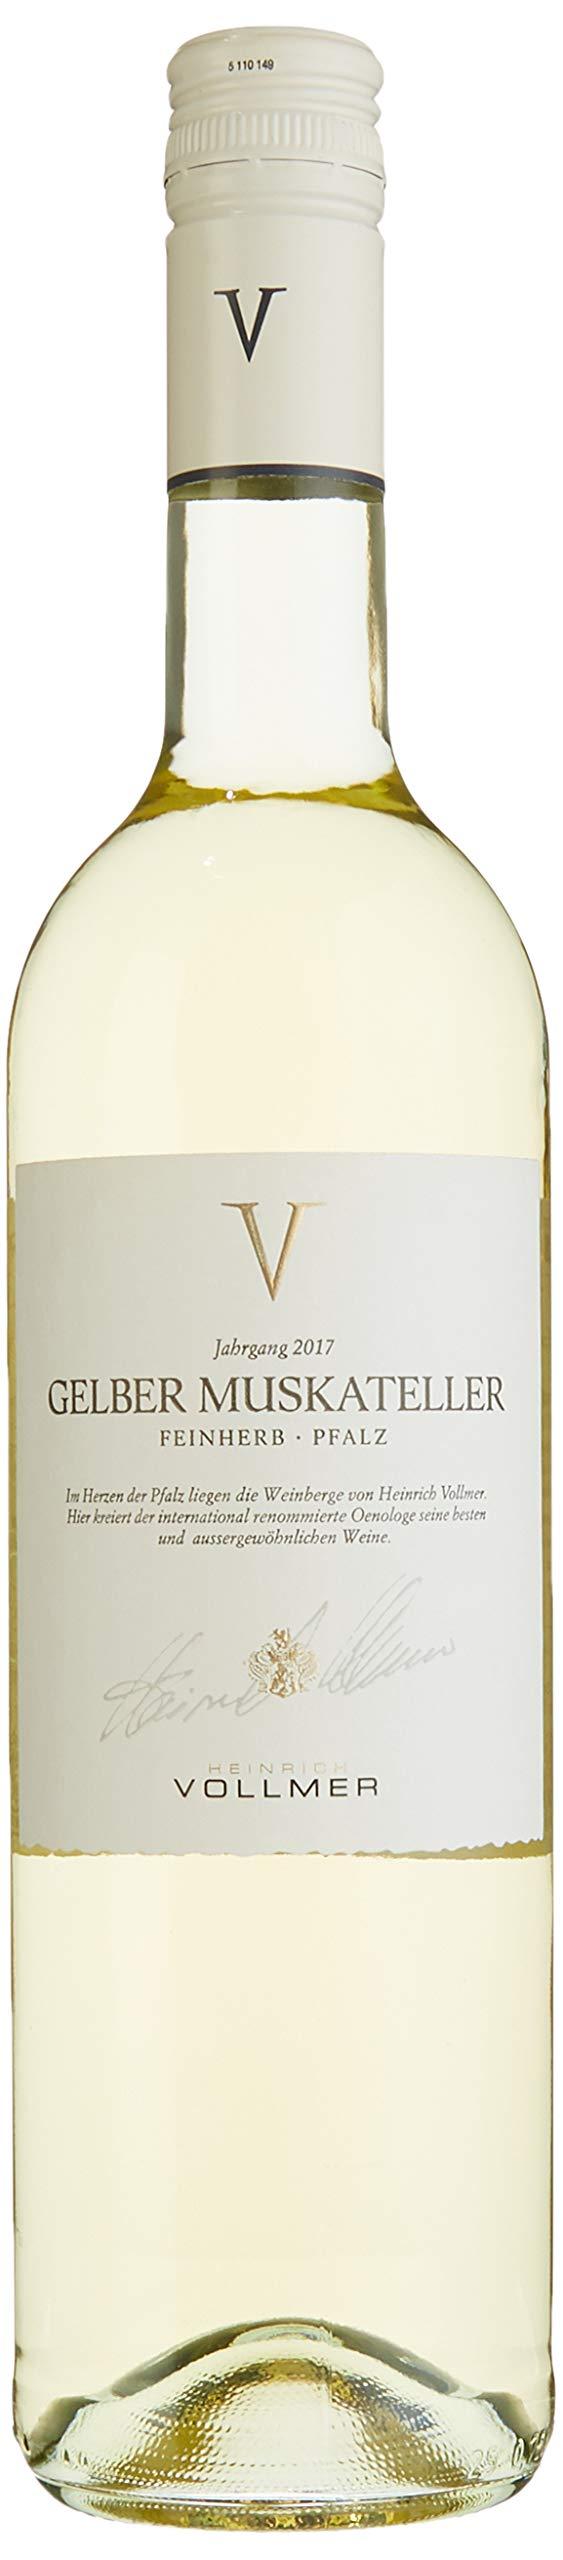 Vollmer-Traubenspiel-Gelber-Muskateller-Feinherb-2015-Halbtrocken-3-x-075-l